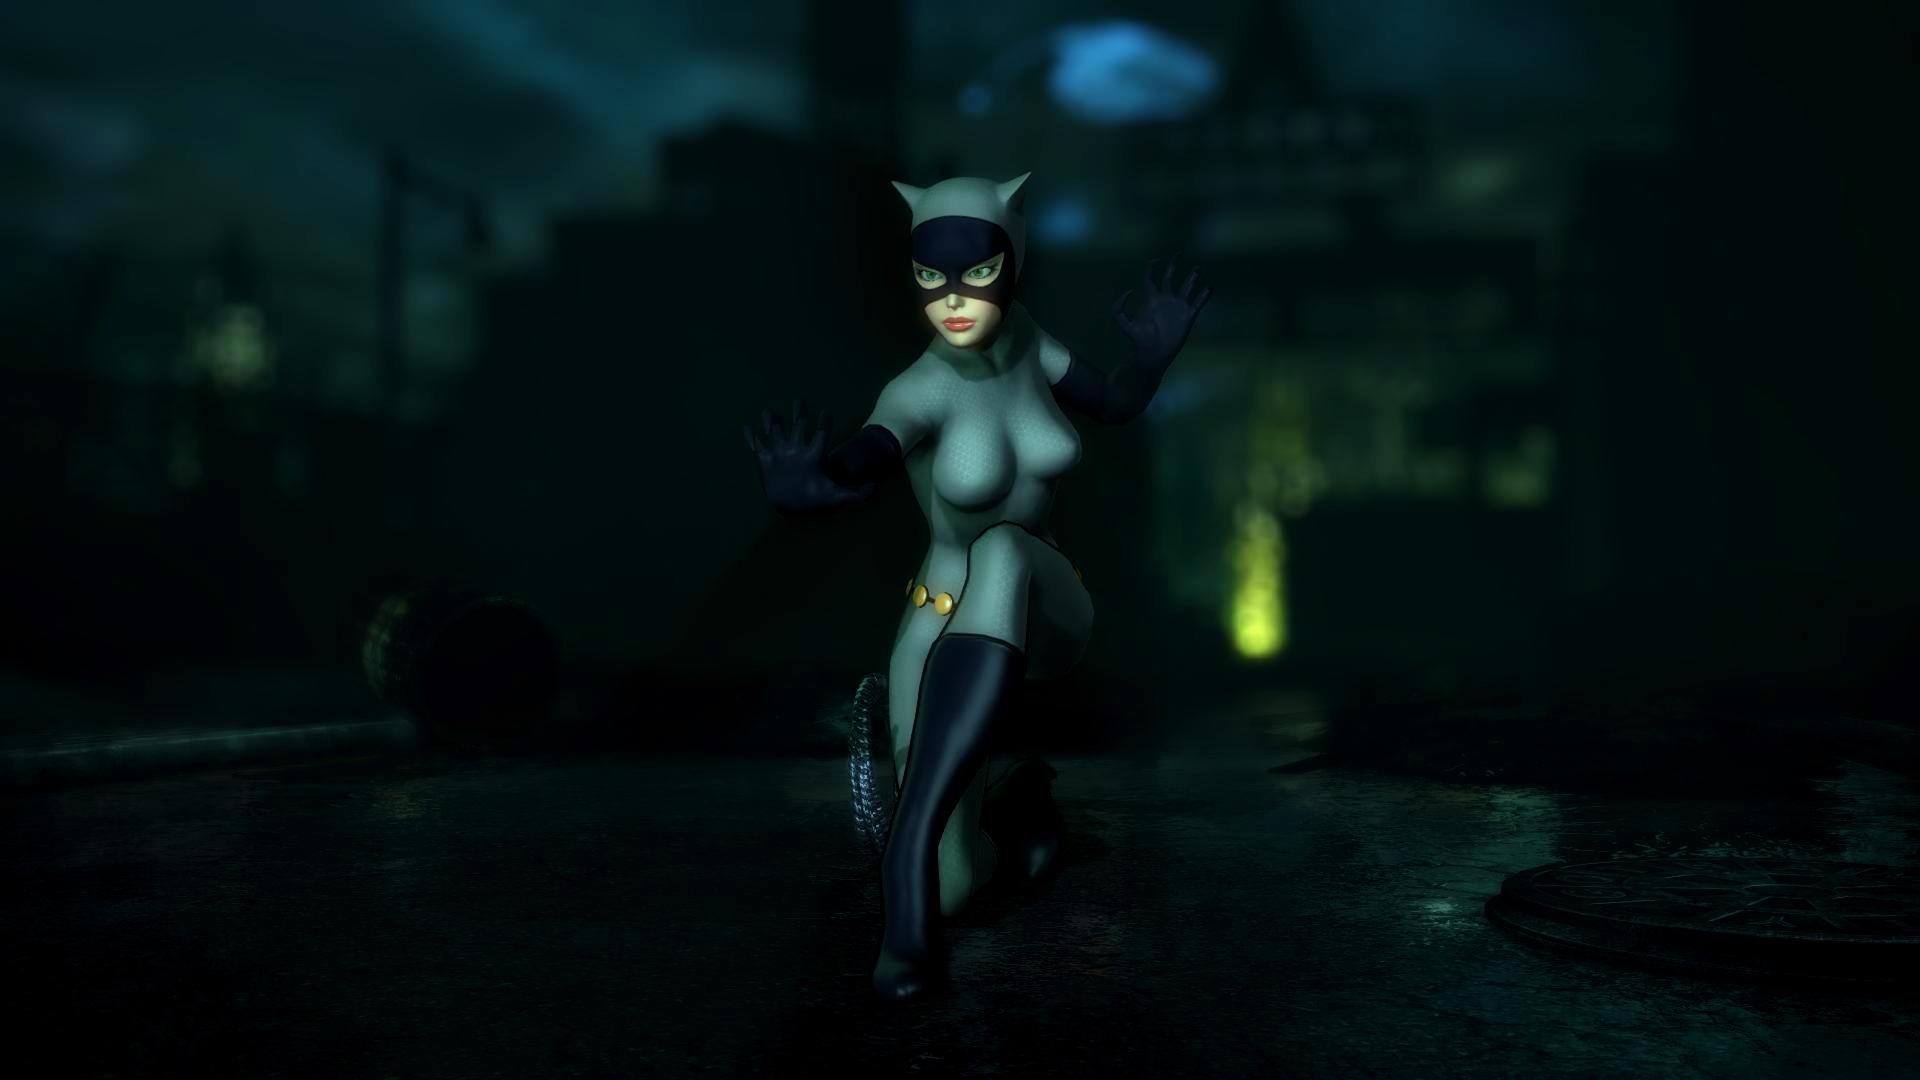 Batman: Arkham City - Catwoman by Gelvuun on DeviantArt